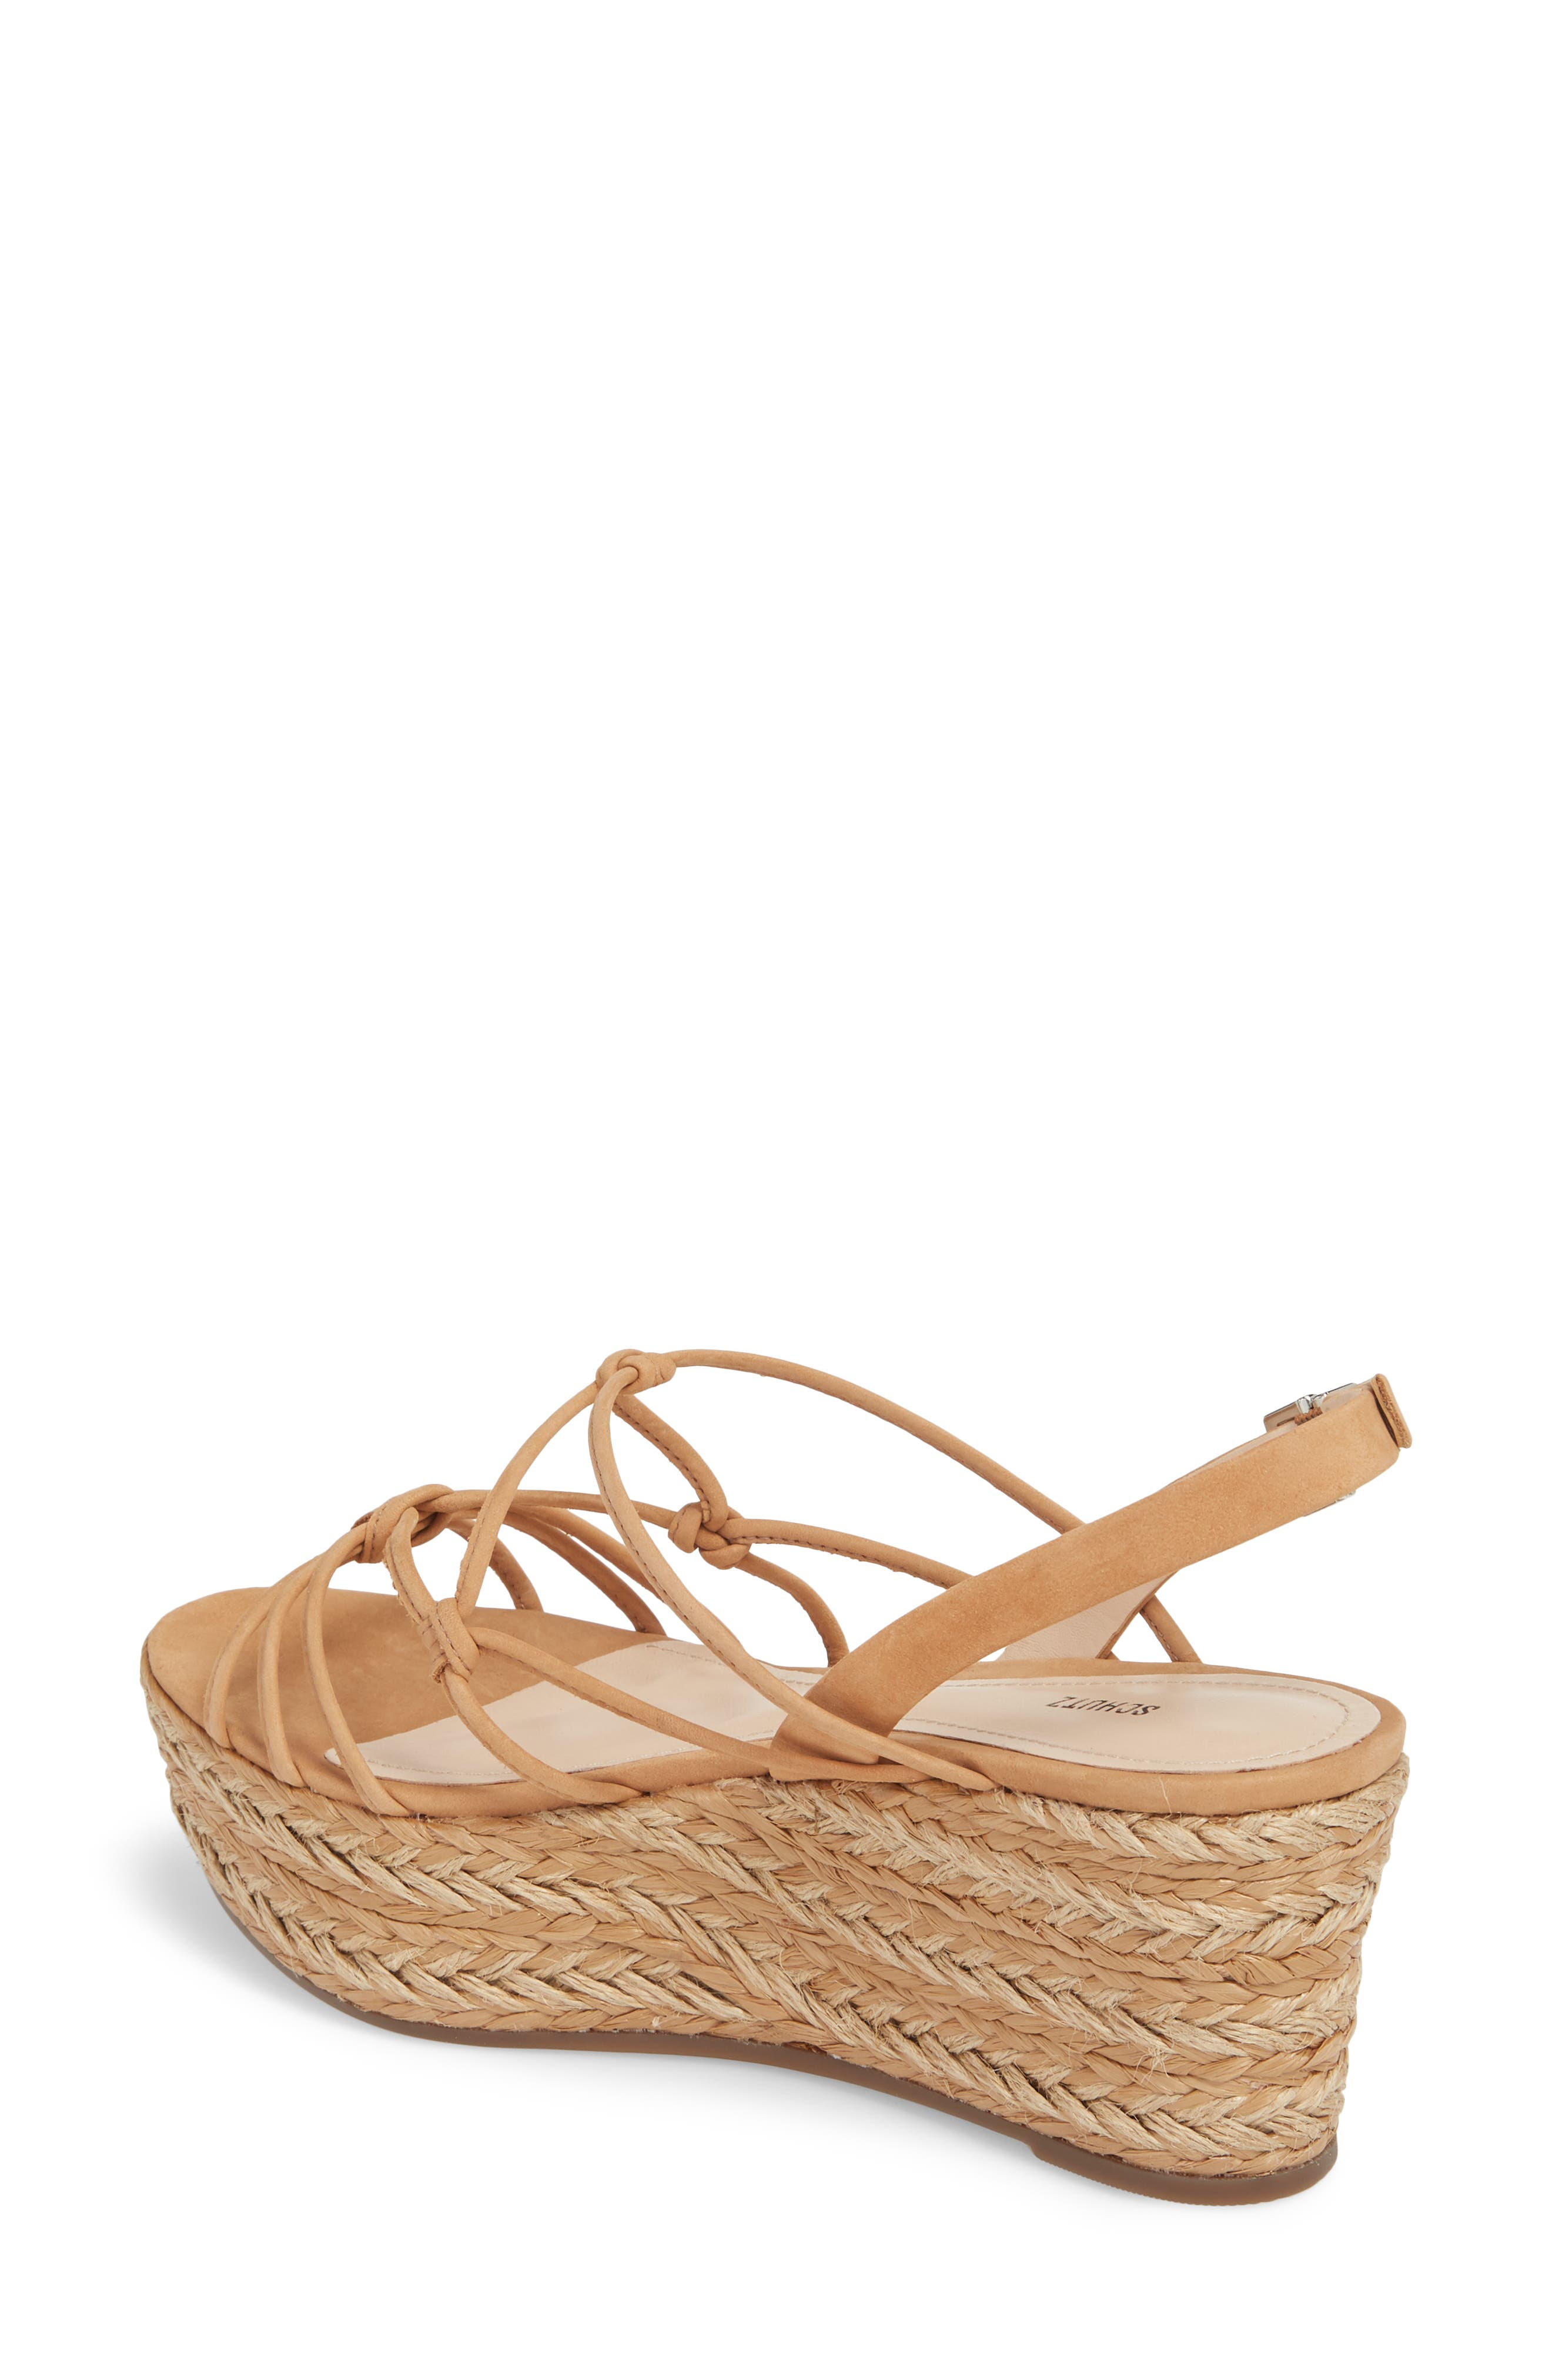 Latussa Platform Espadrille Sandal,                             Alternate thumbnail 2, color,                             Desert Leather